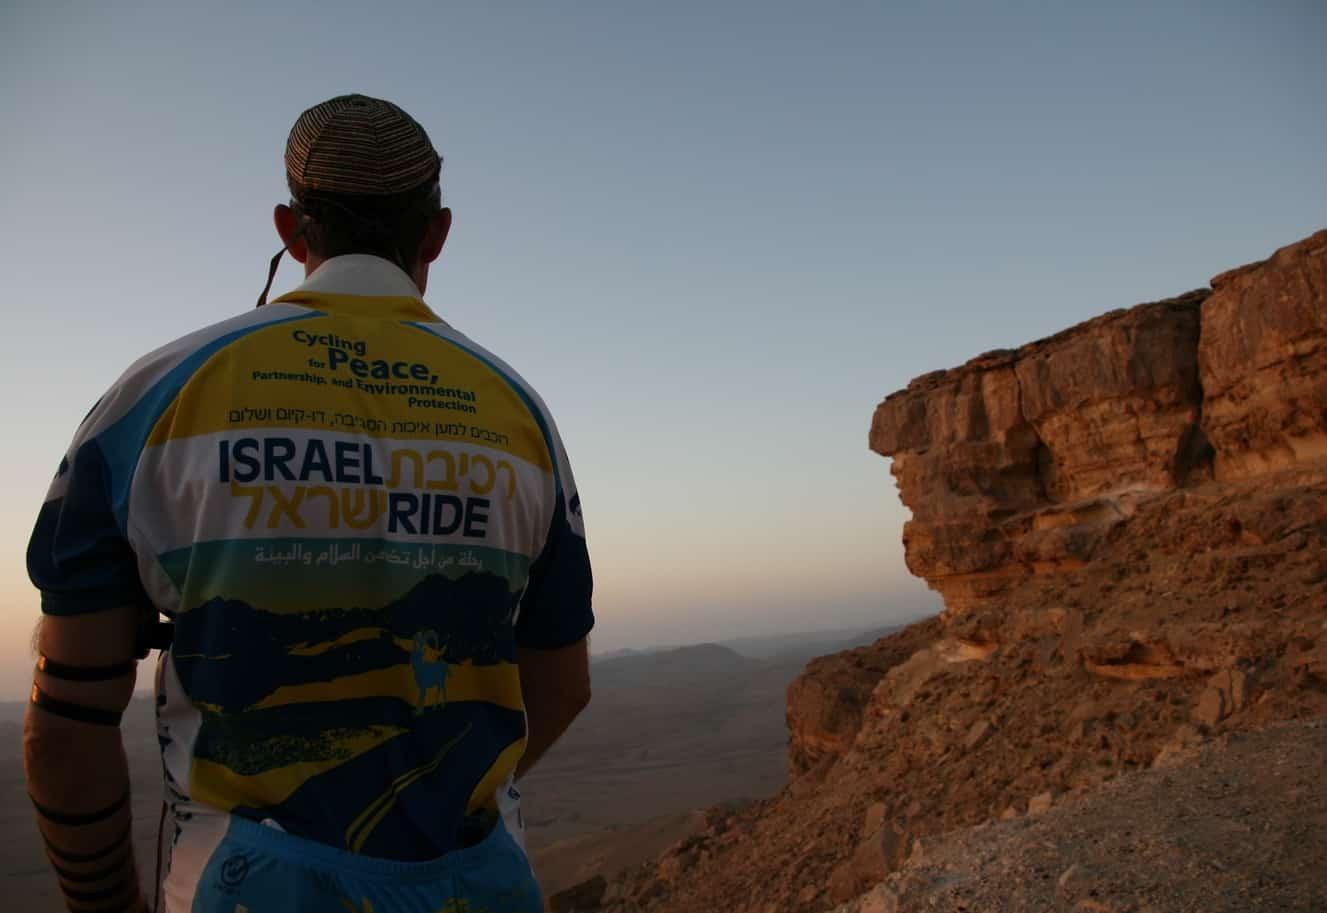 Israel Ride 2010 image